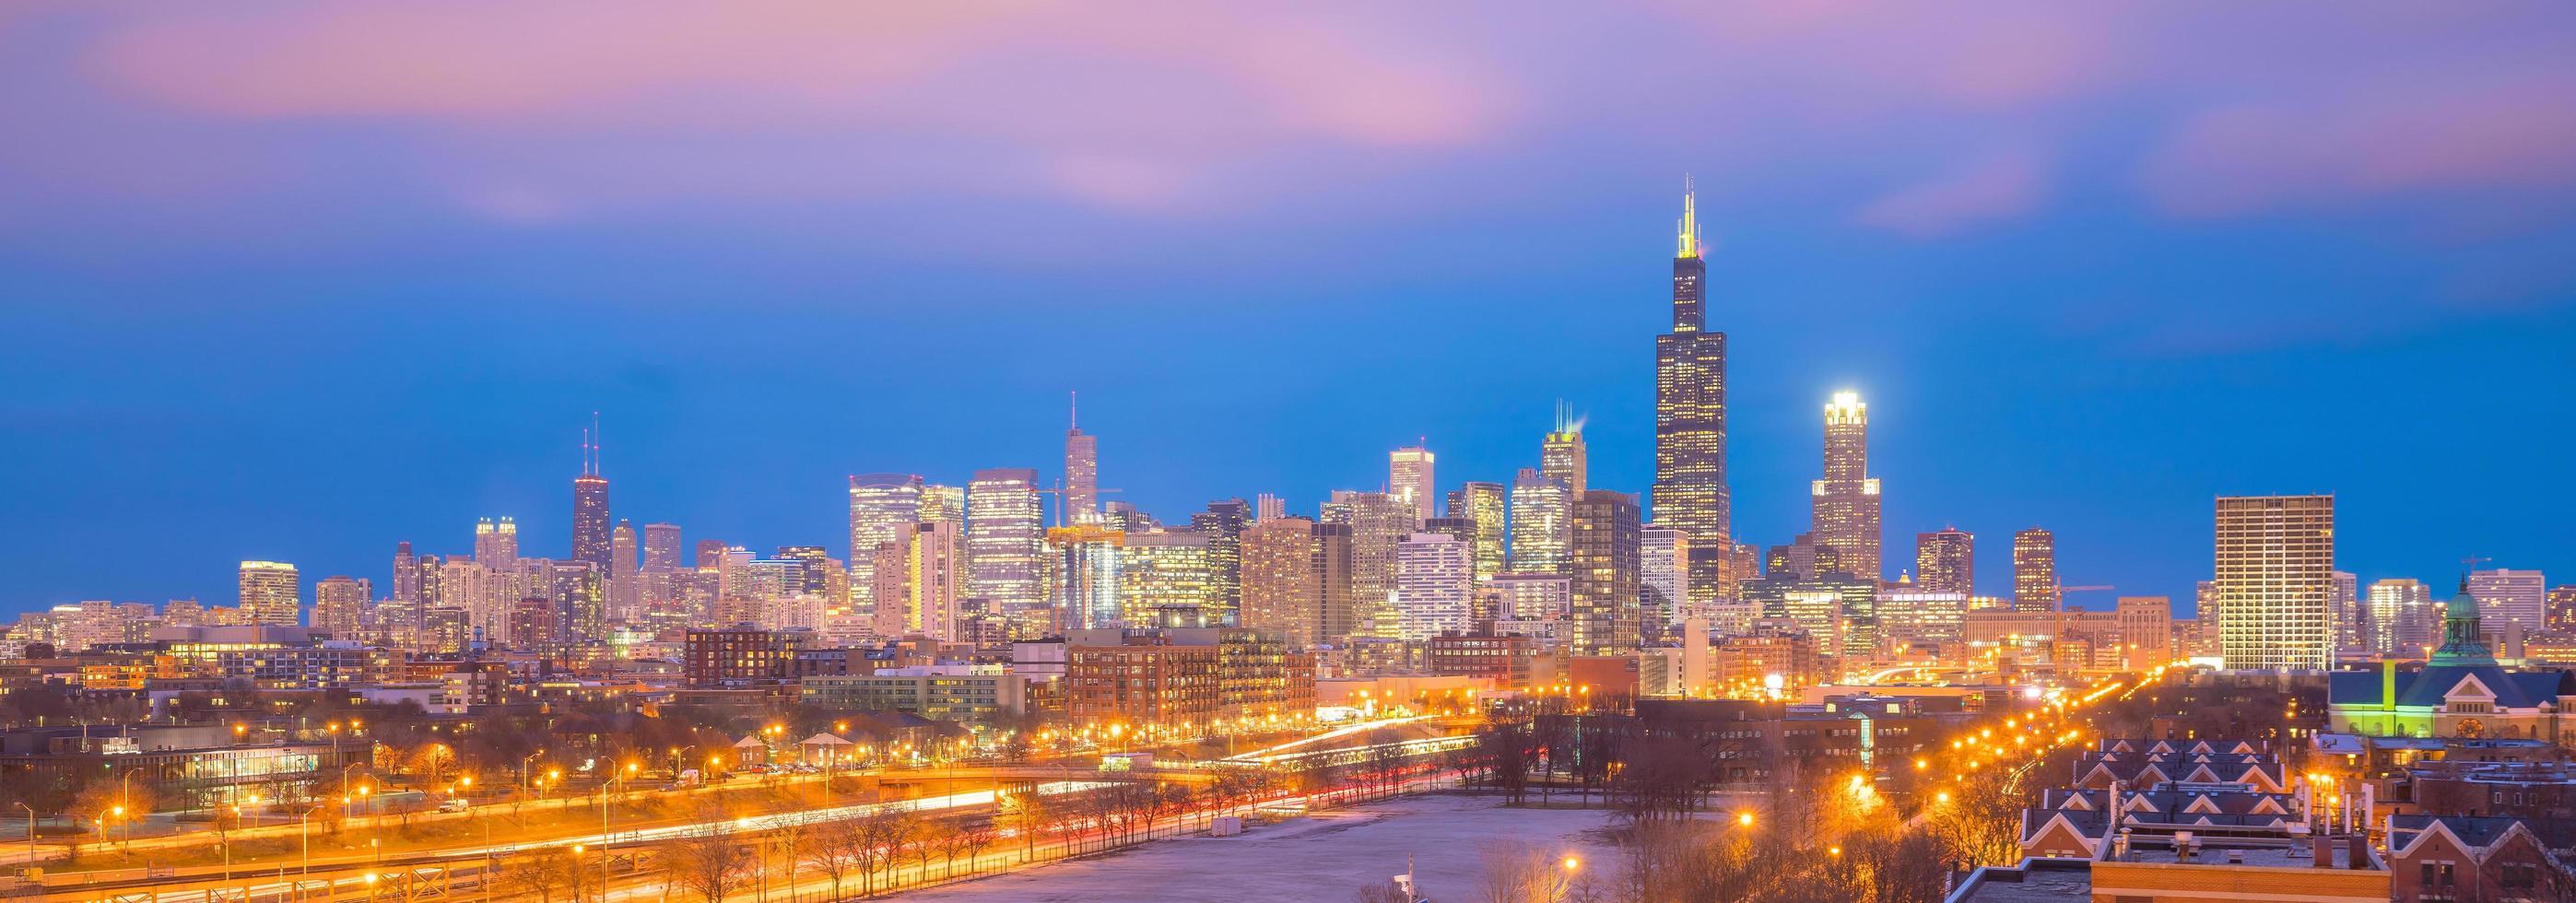 skyline van downtown chicago bij zonsondergang illinois foto